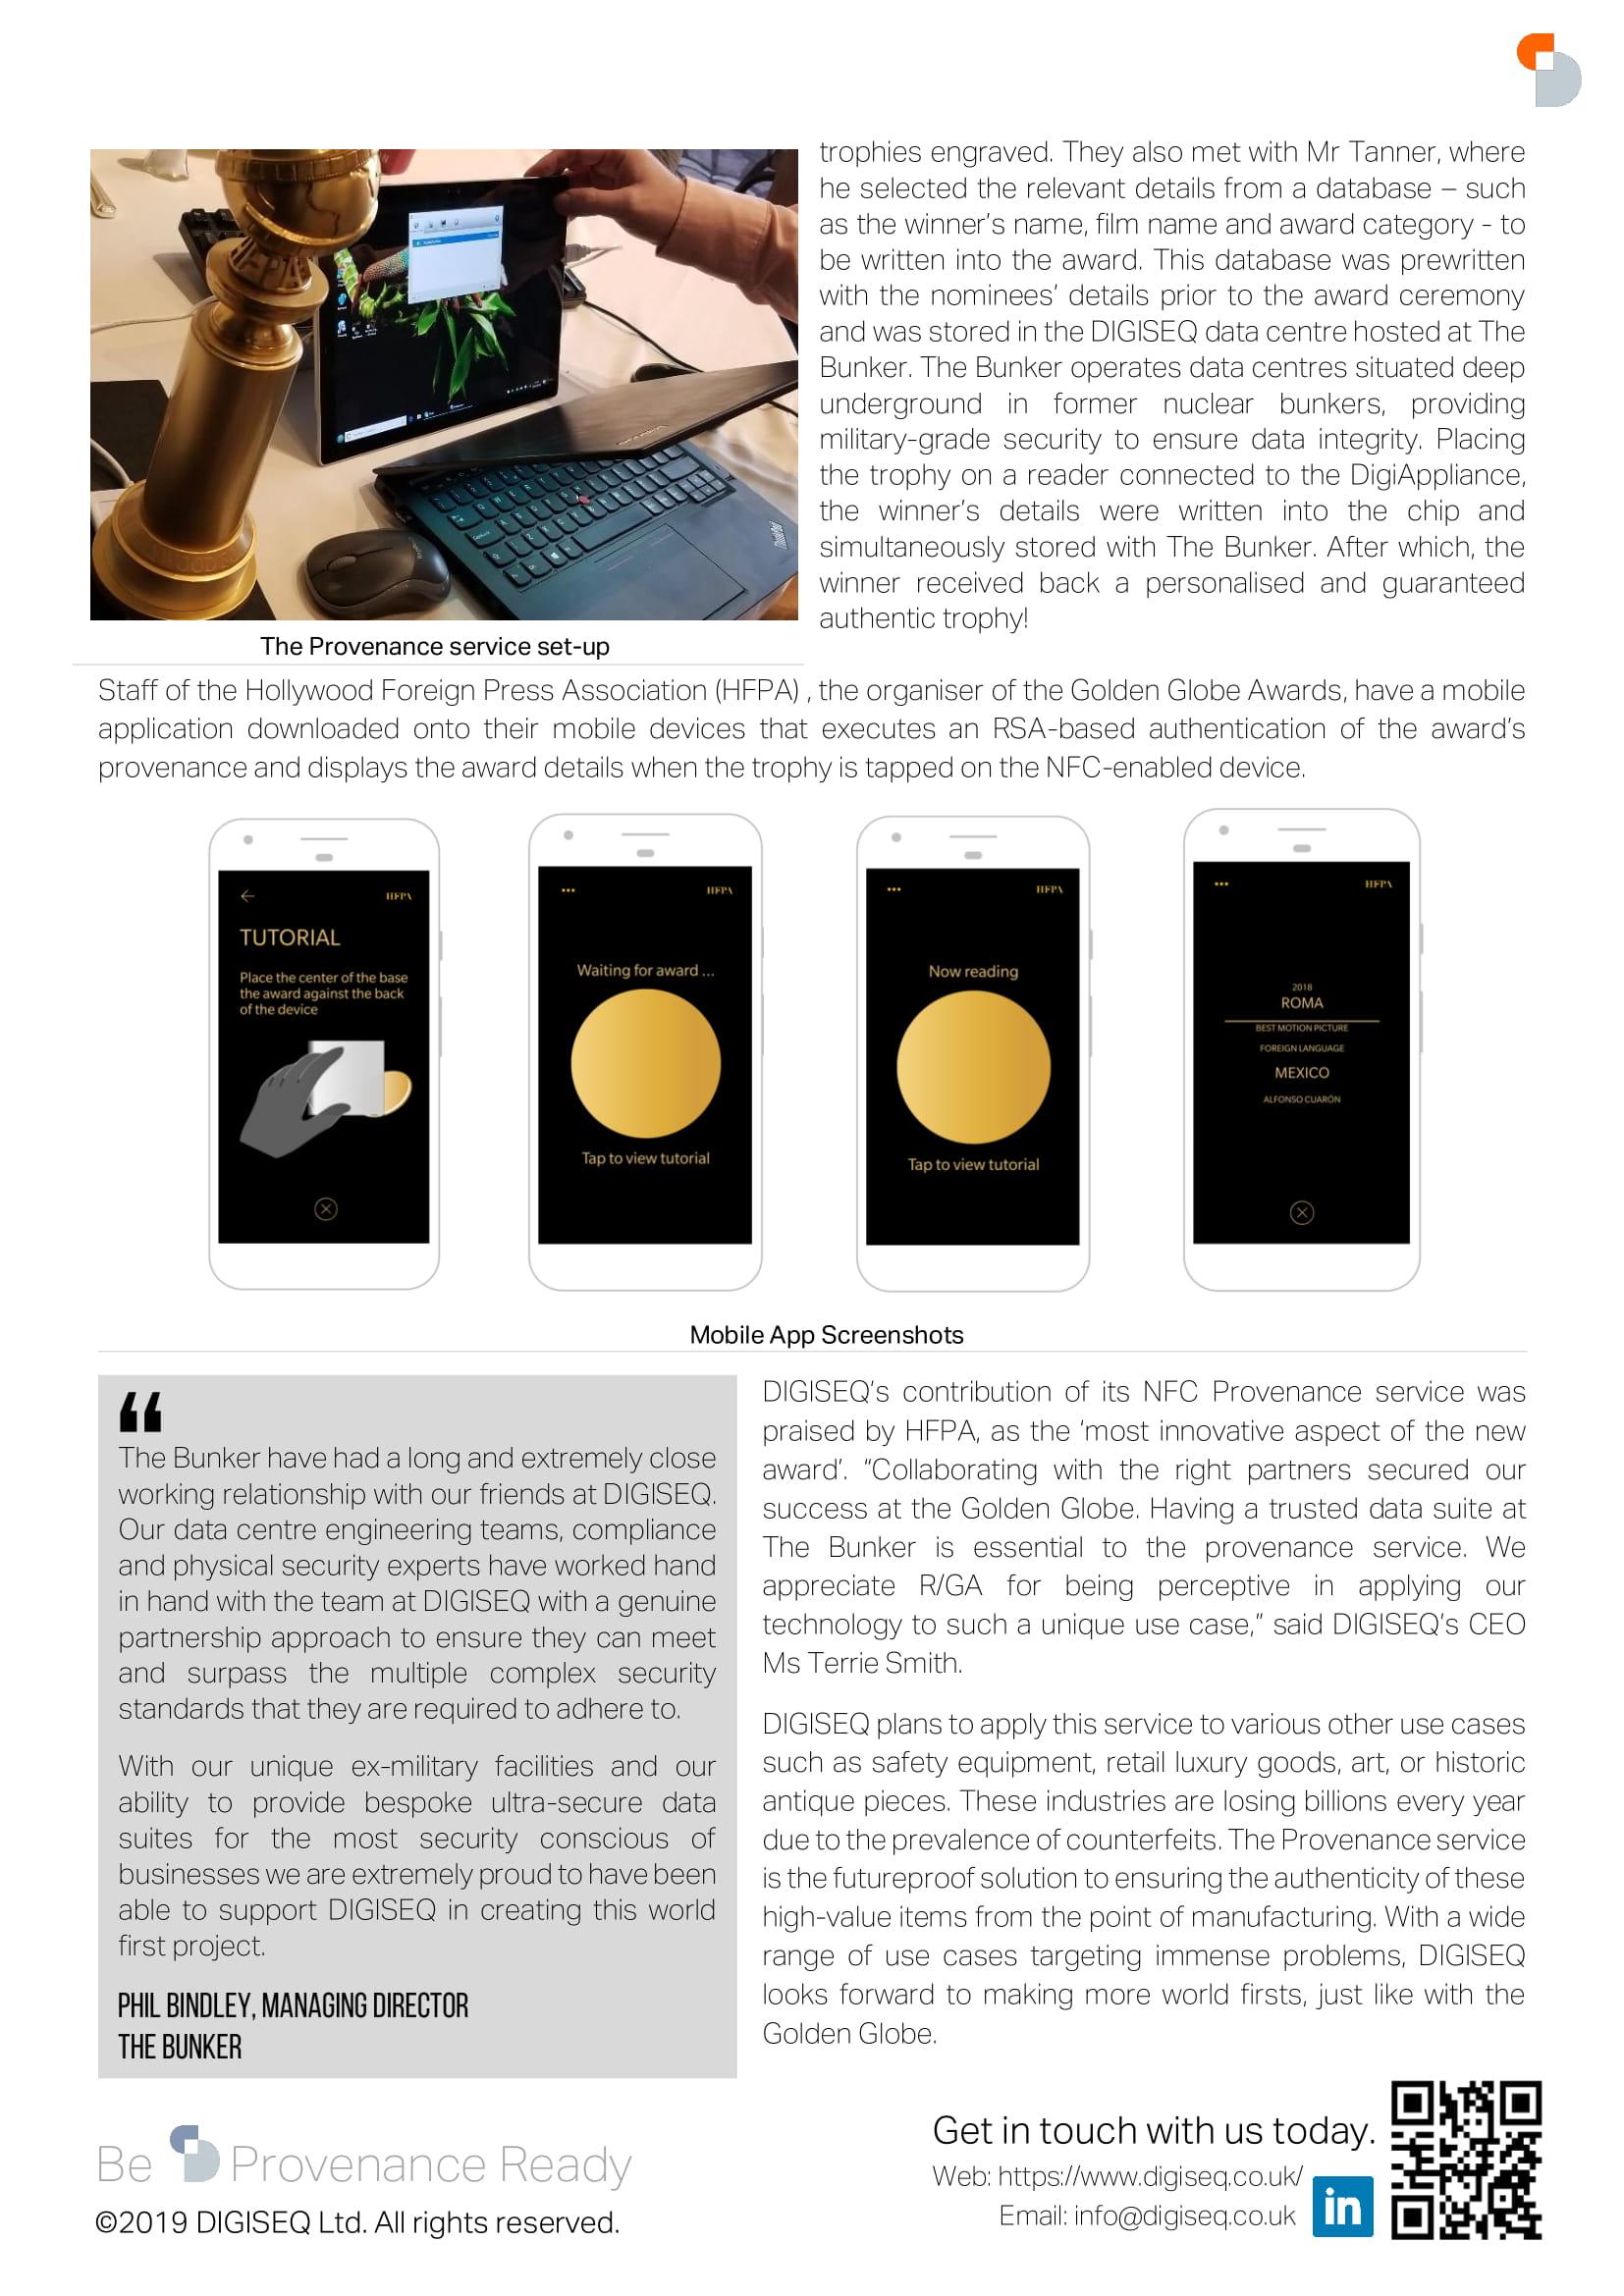 digiseq golden globe case study 2